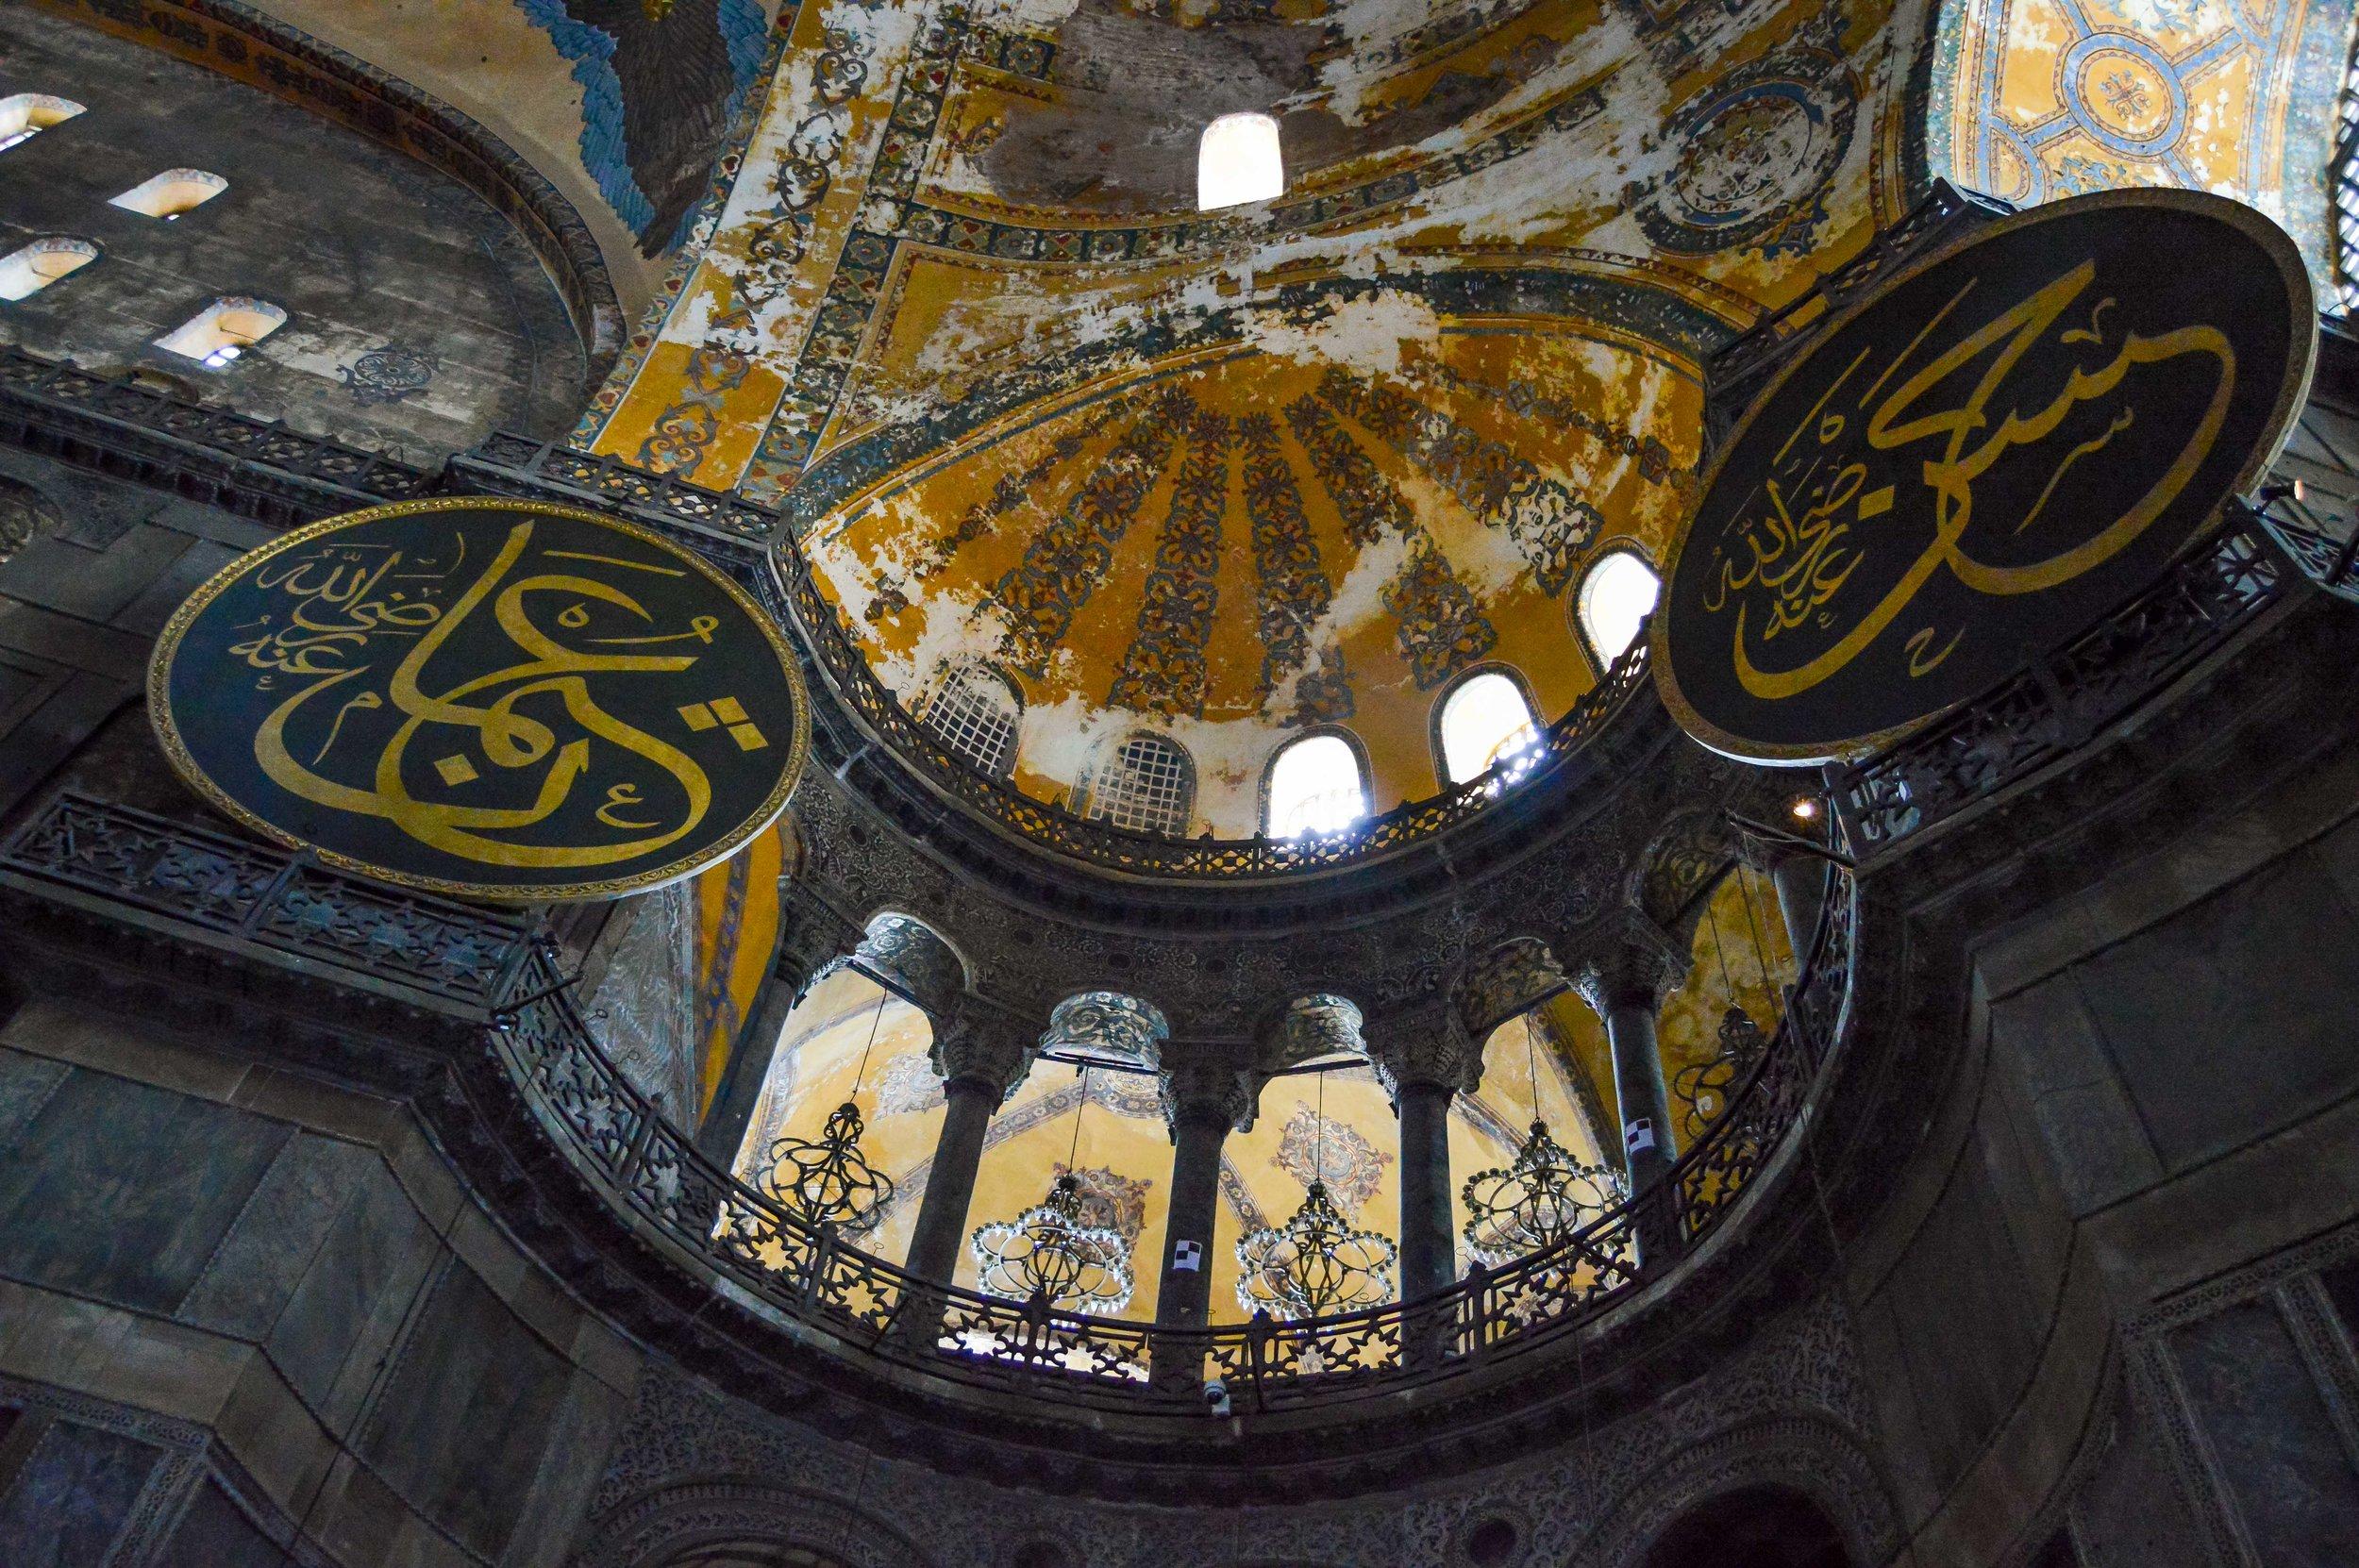 Hagia Sophia interior Mosaic Tile Paint Muslim Ottoman Empire Constantinople Architecture Istanbul Turkey